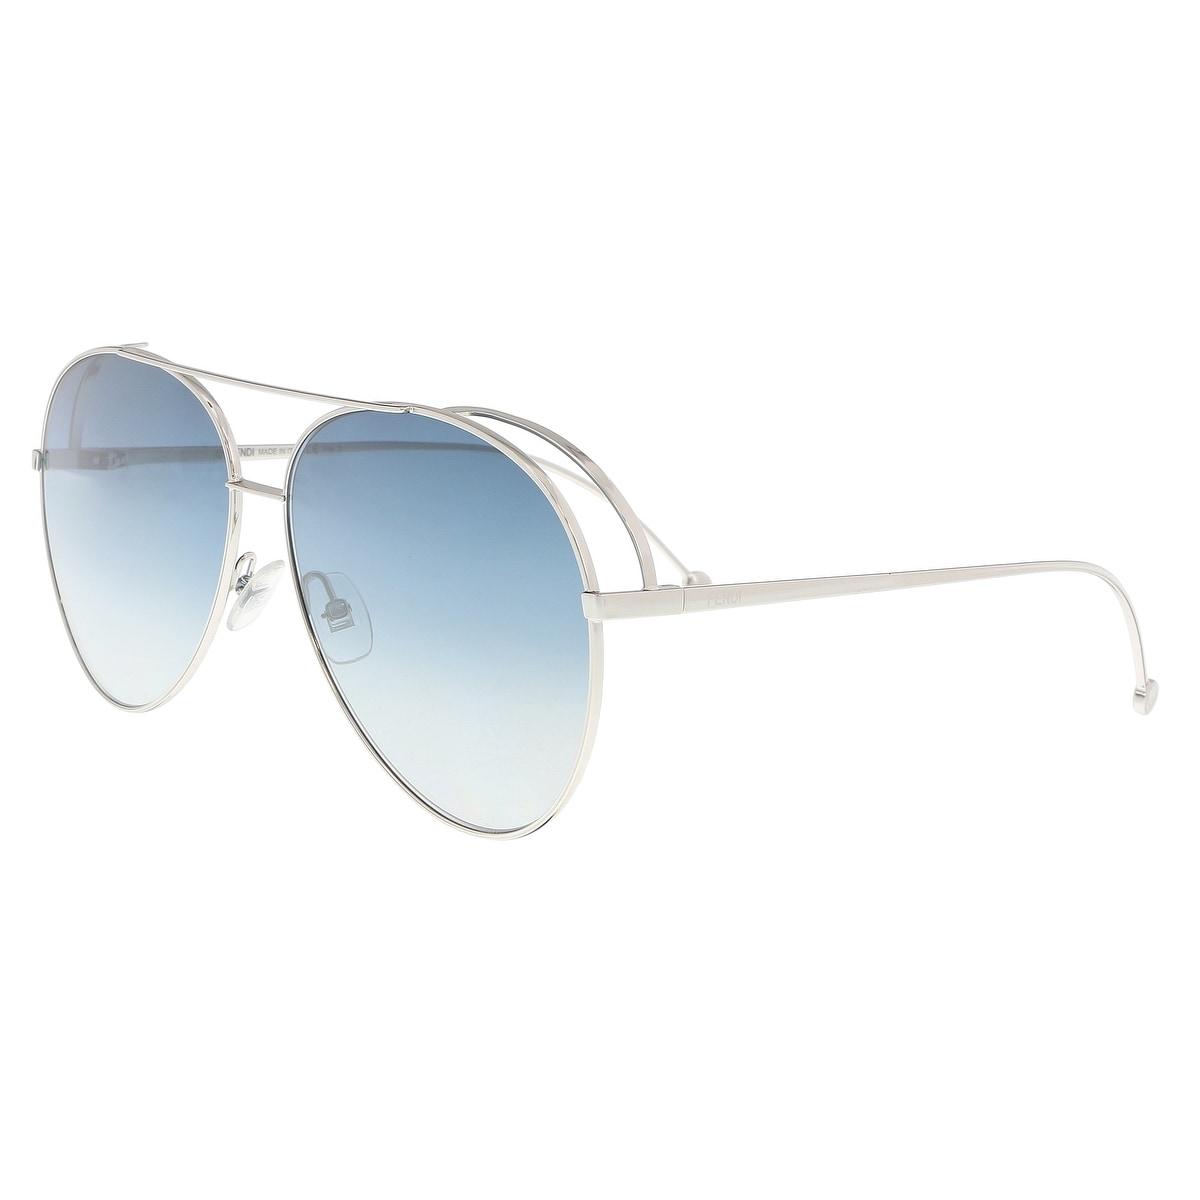 faa9b226caff Fendi Women's Sunglasses   Find Great Sunglasses Deals Shopping at Overstock